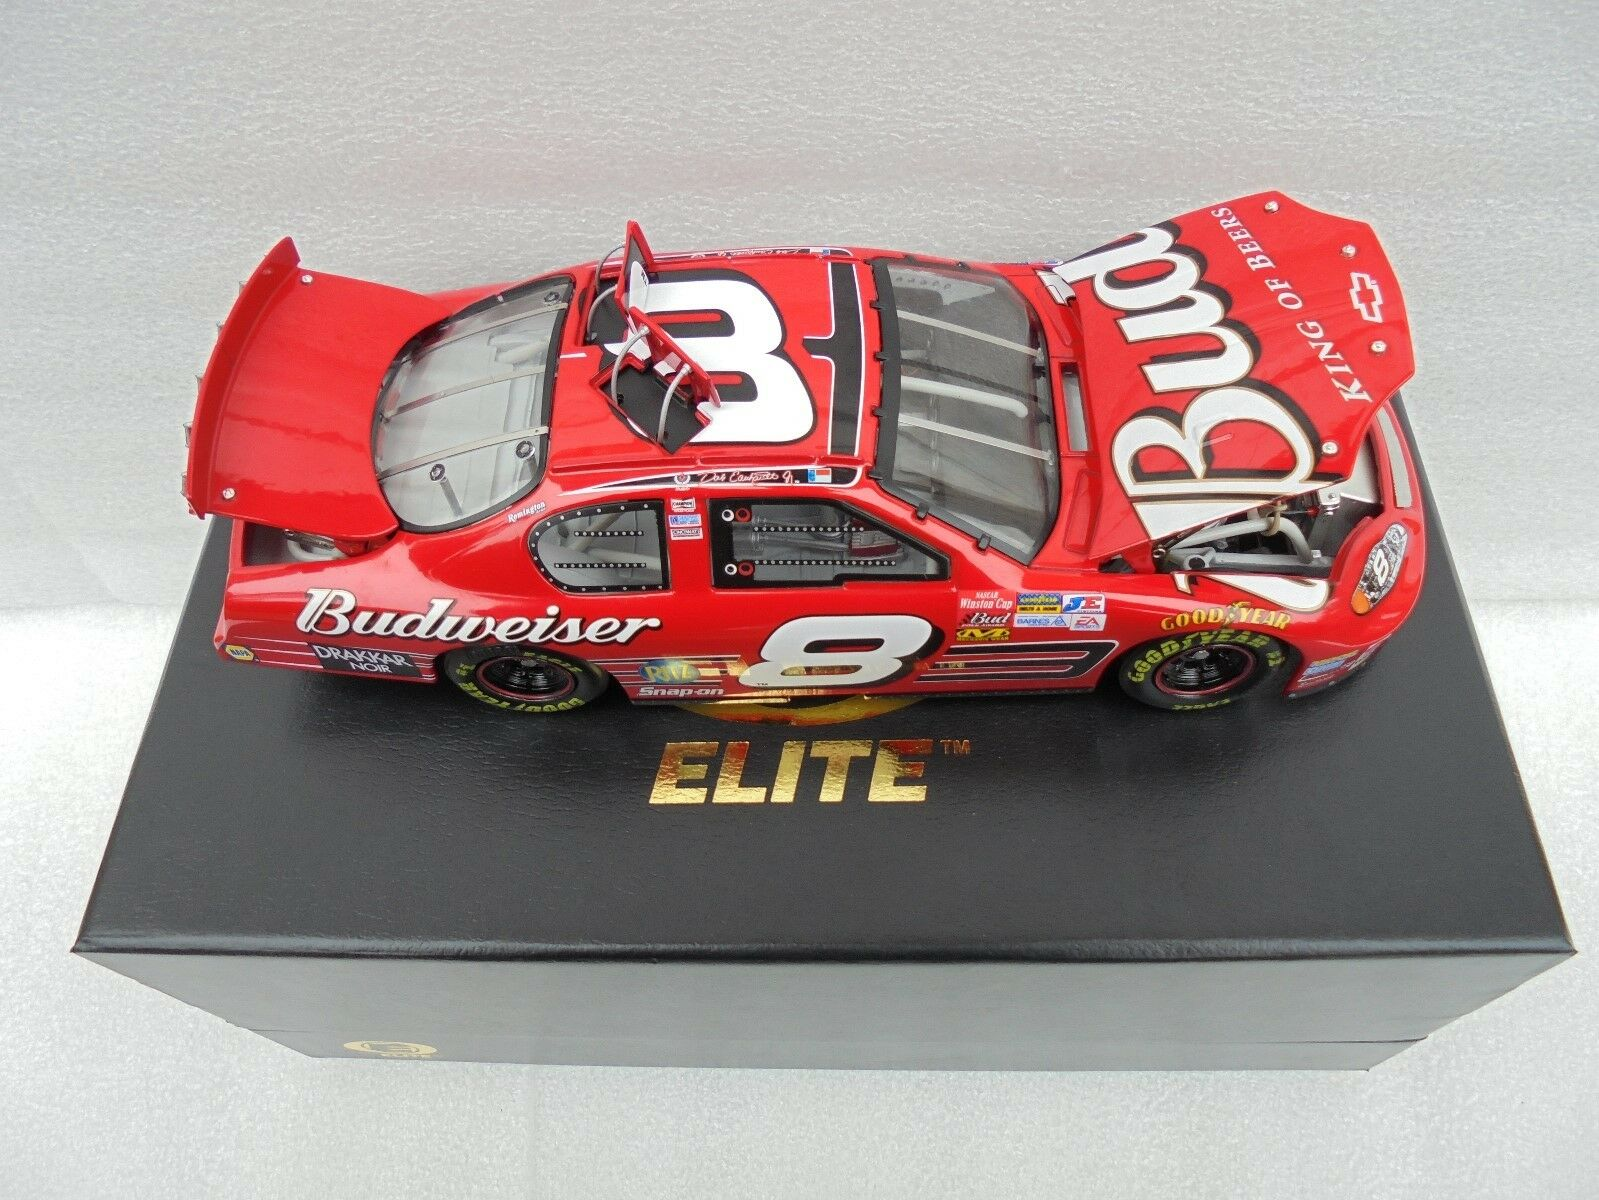 Dale Earnhardt Jr  8 Budweiser 2003 Monte Cochelo Acción Racing Collectables Club of America Elite NasCoche Diecast